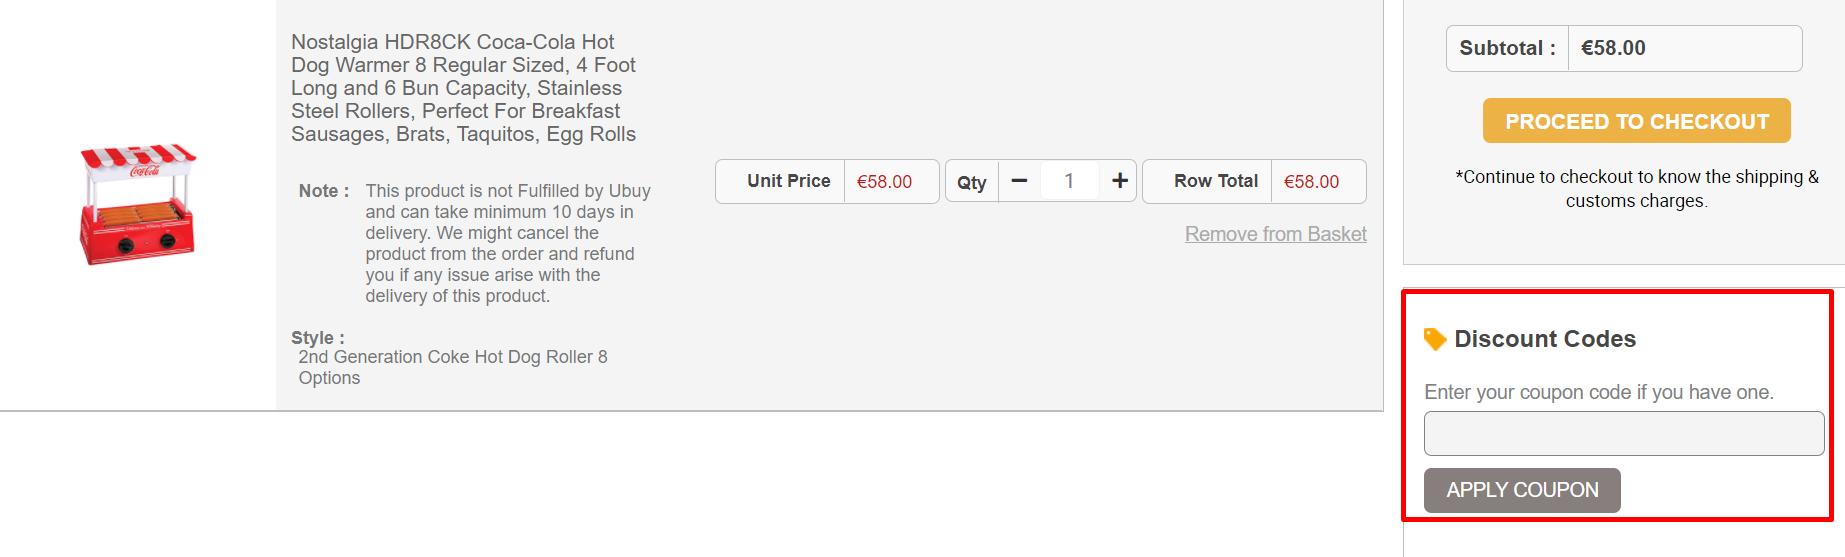 How do I use my Ubuy discount code?